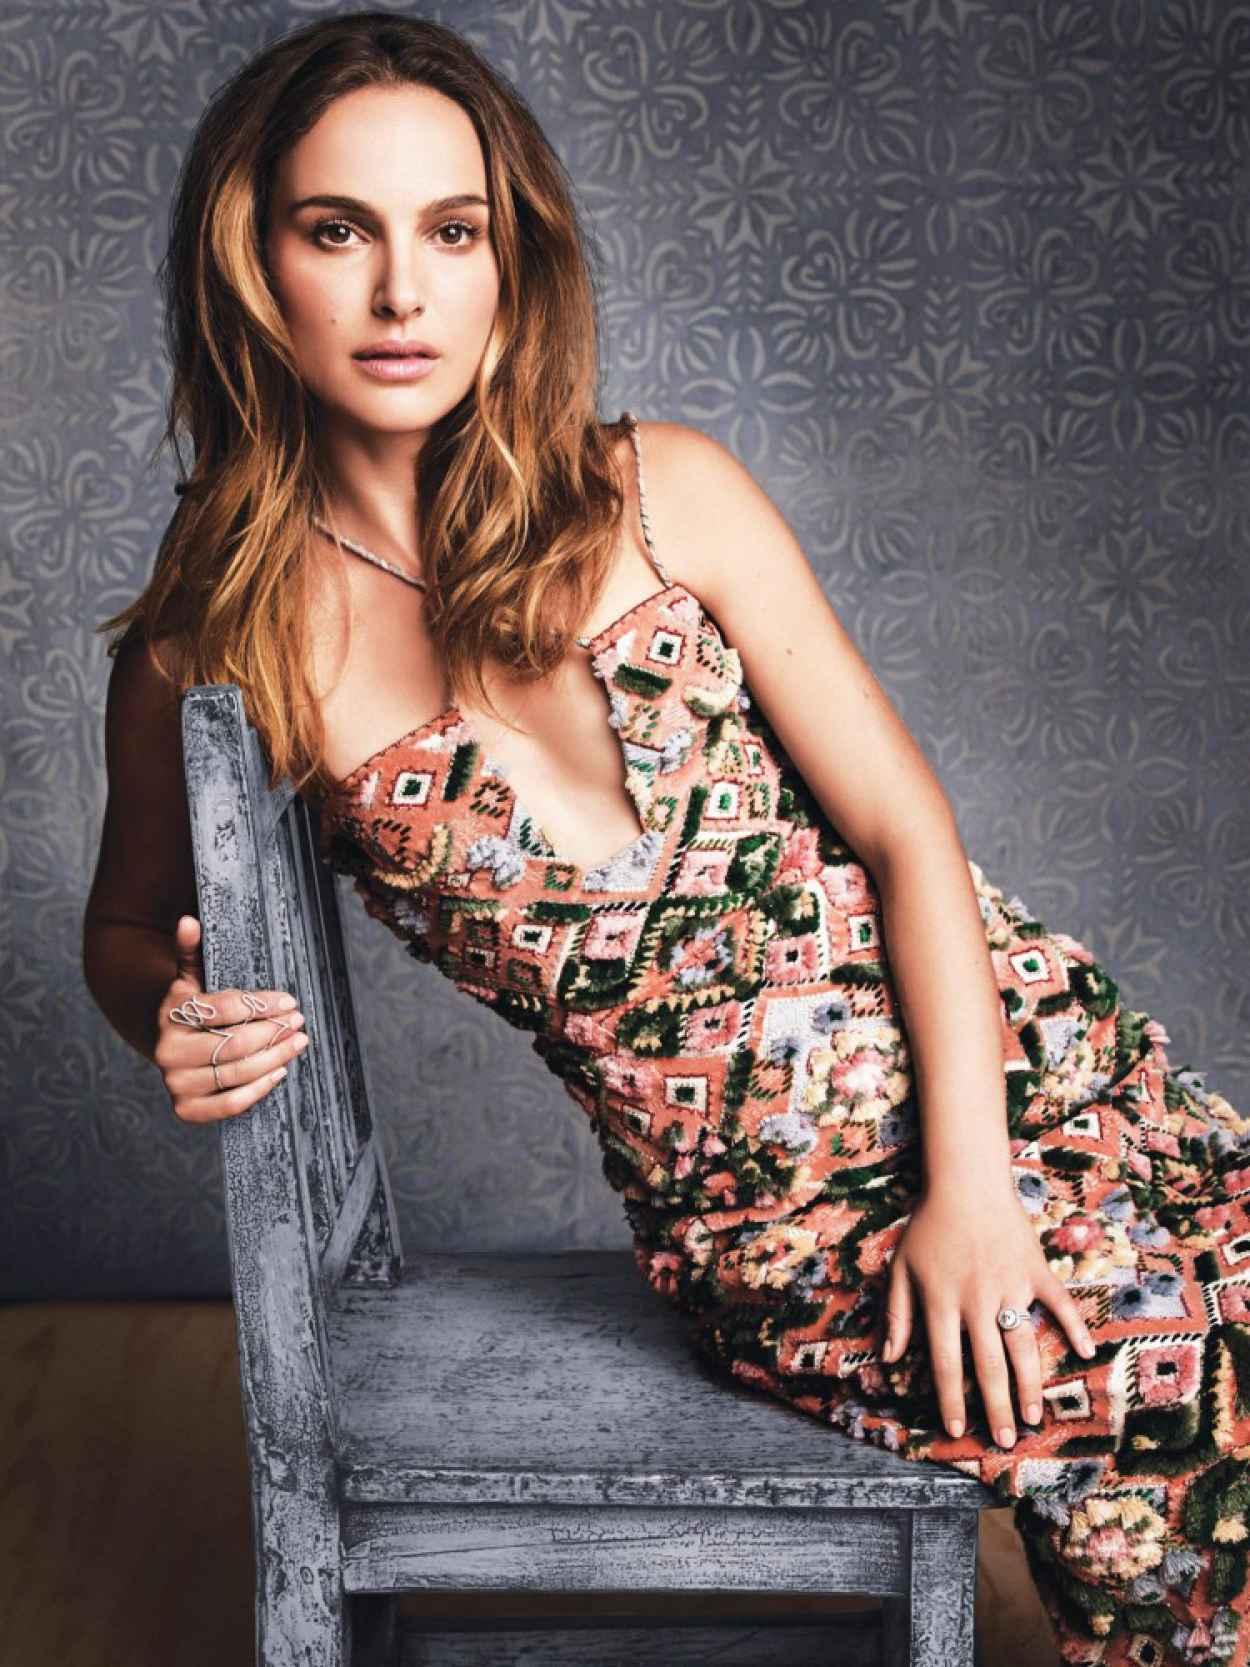 Natalie Portman – Page 2 – celebsla.com Natalie Portman